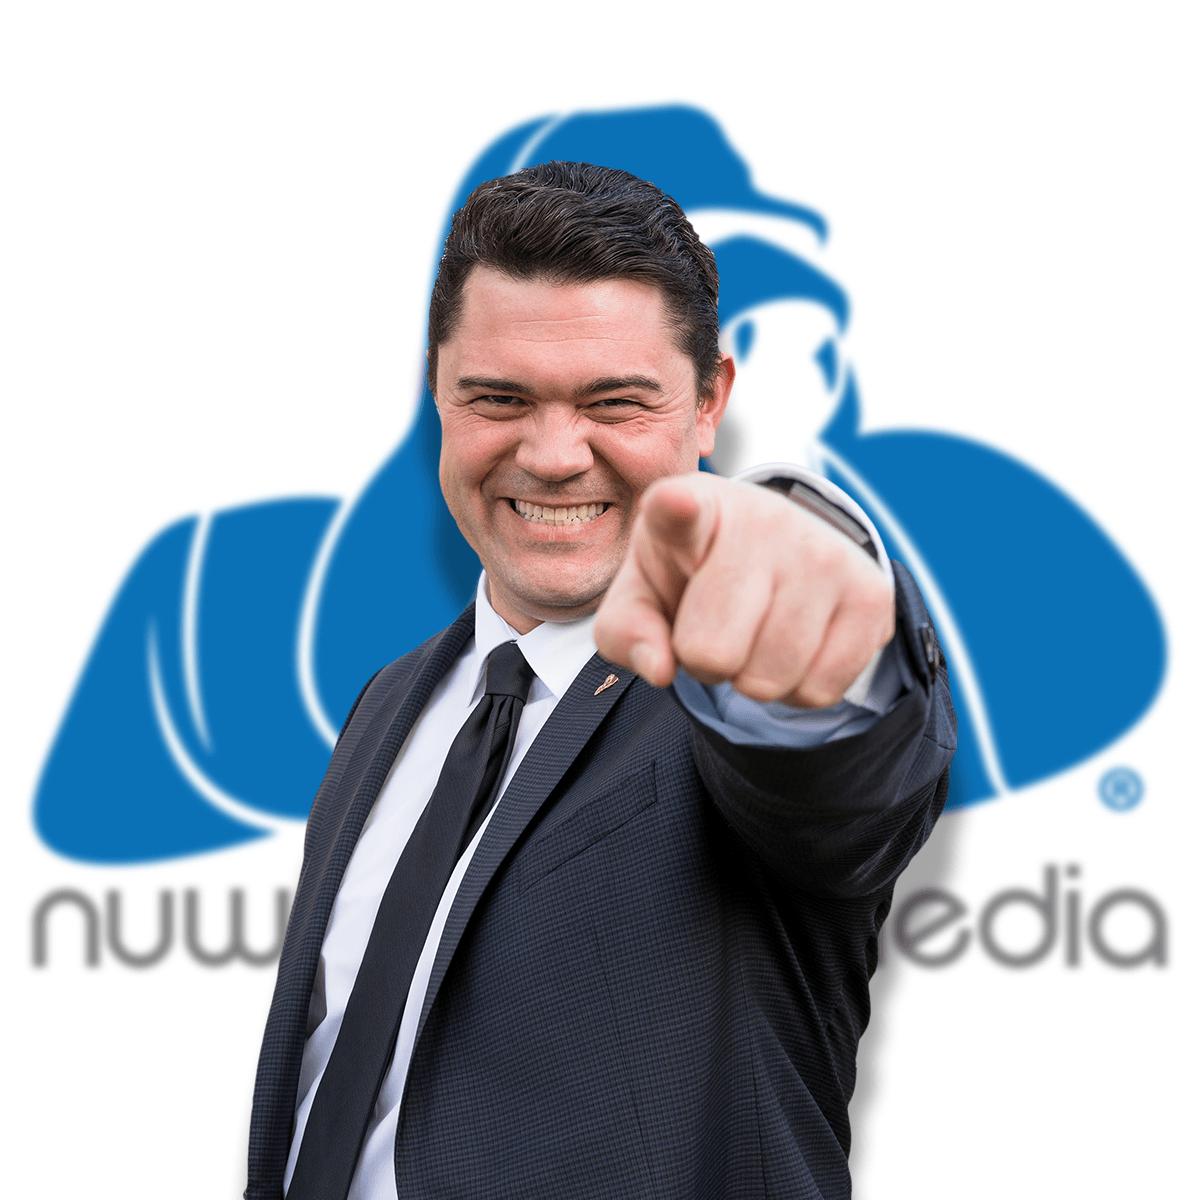 NuwudMM-Patrick_ProfilePic